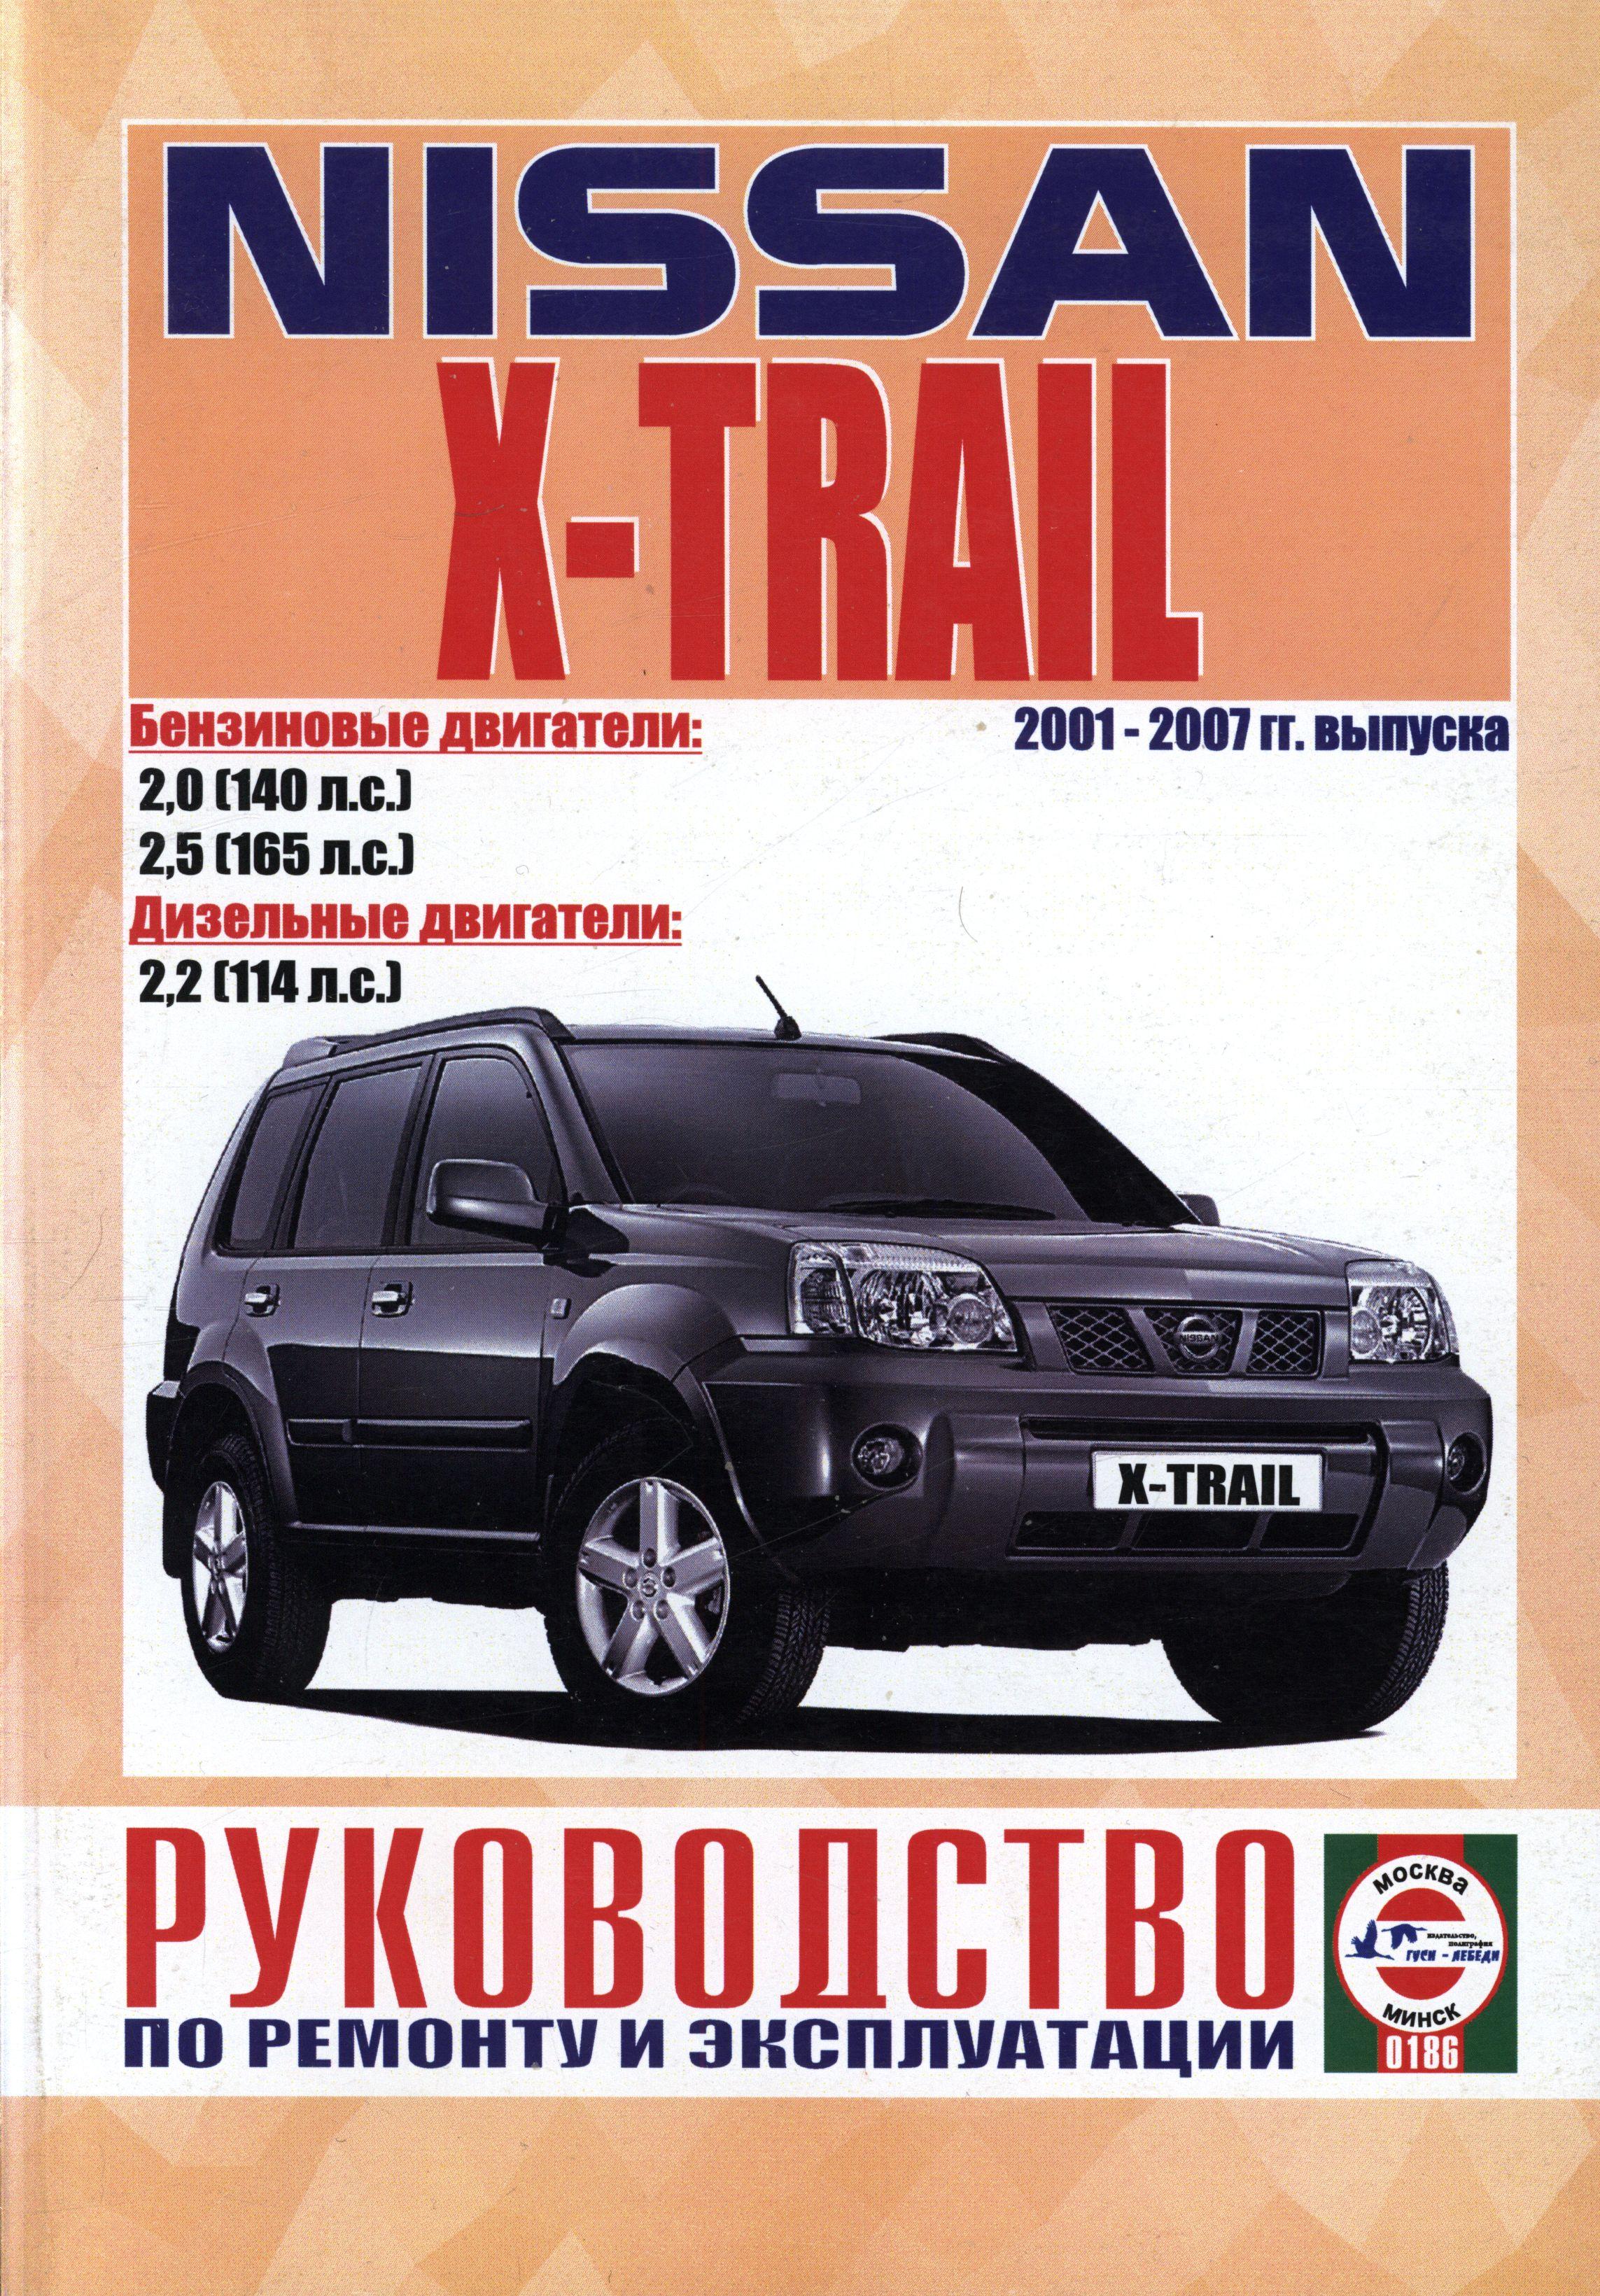 NISSAN X-TRAIL 2001-2007 бензин / дизель Книга по ремонту и эксплуатации